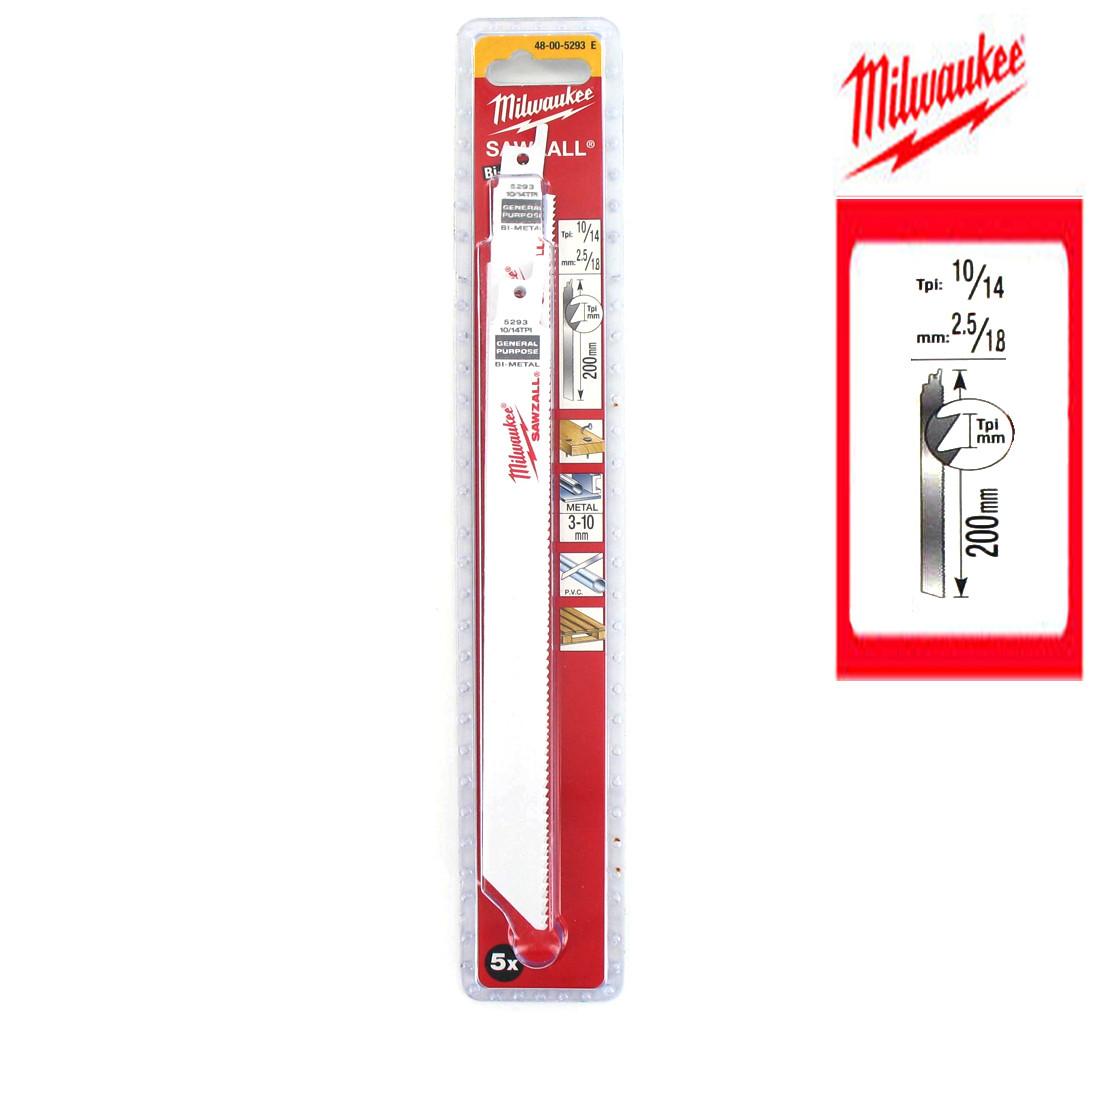 MILWAUKEE 48005293 bi 200MM x 10//14 tpi scie sabre lames